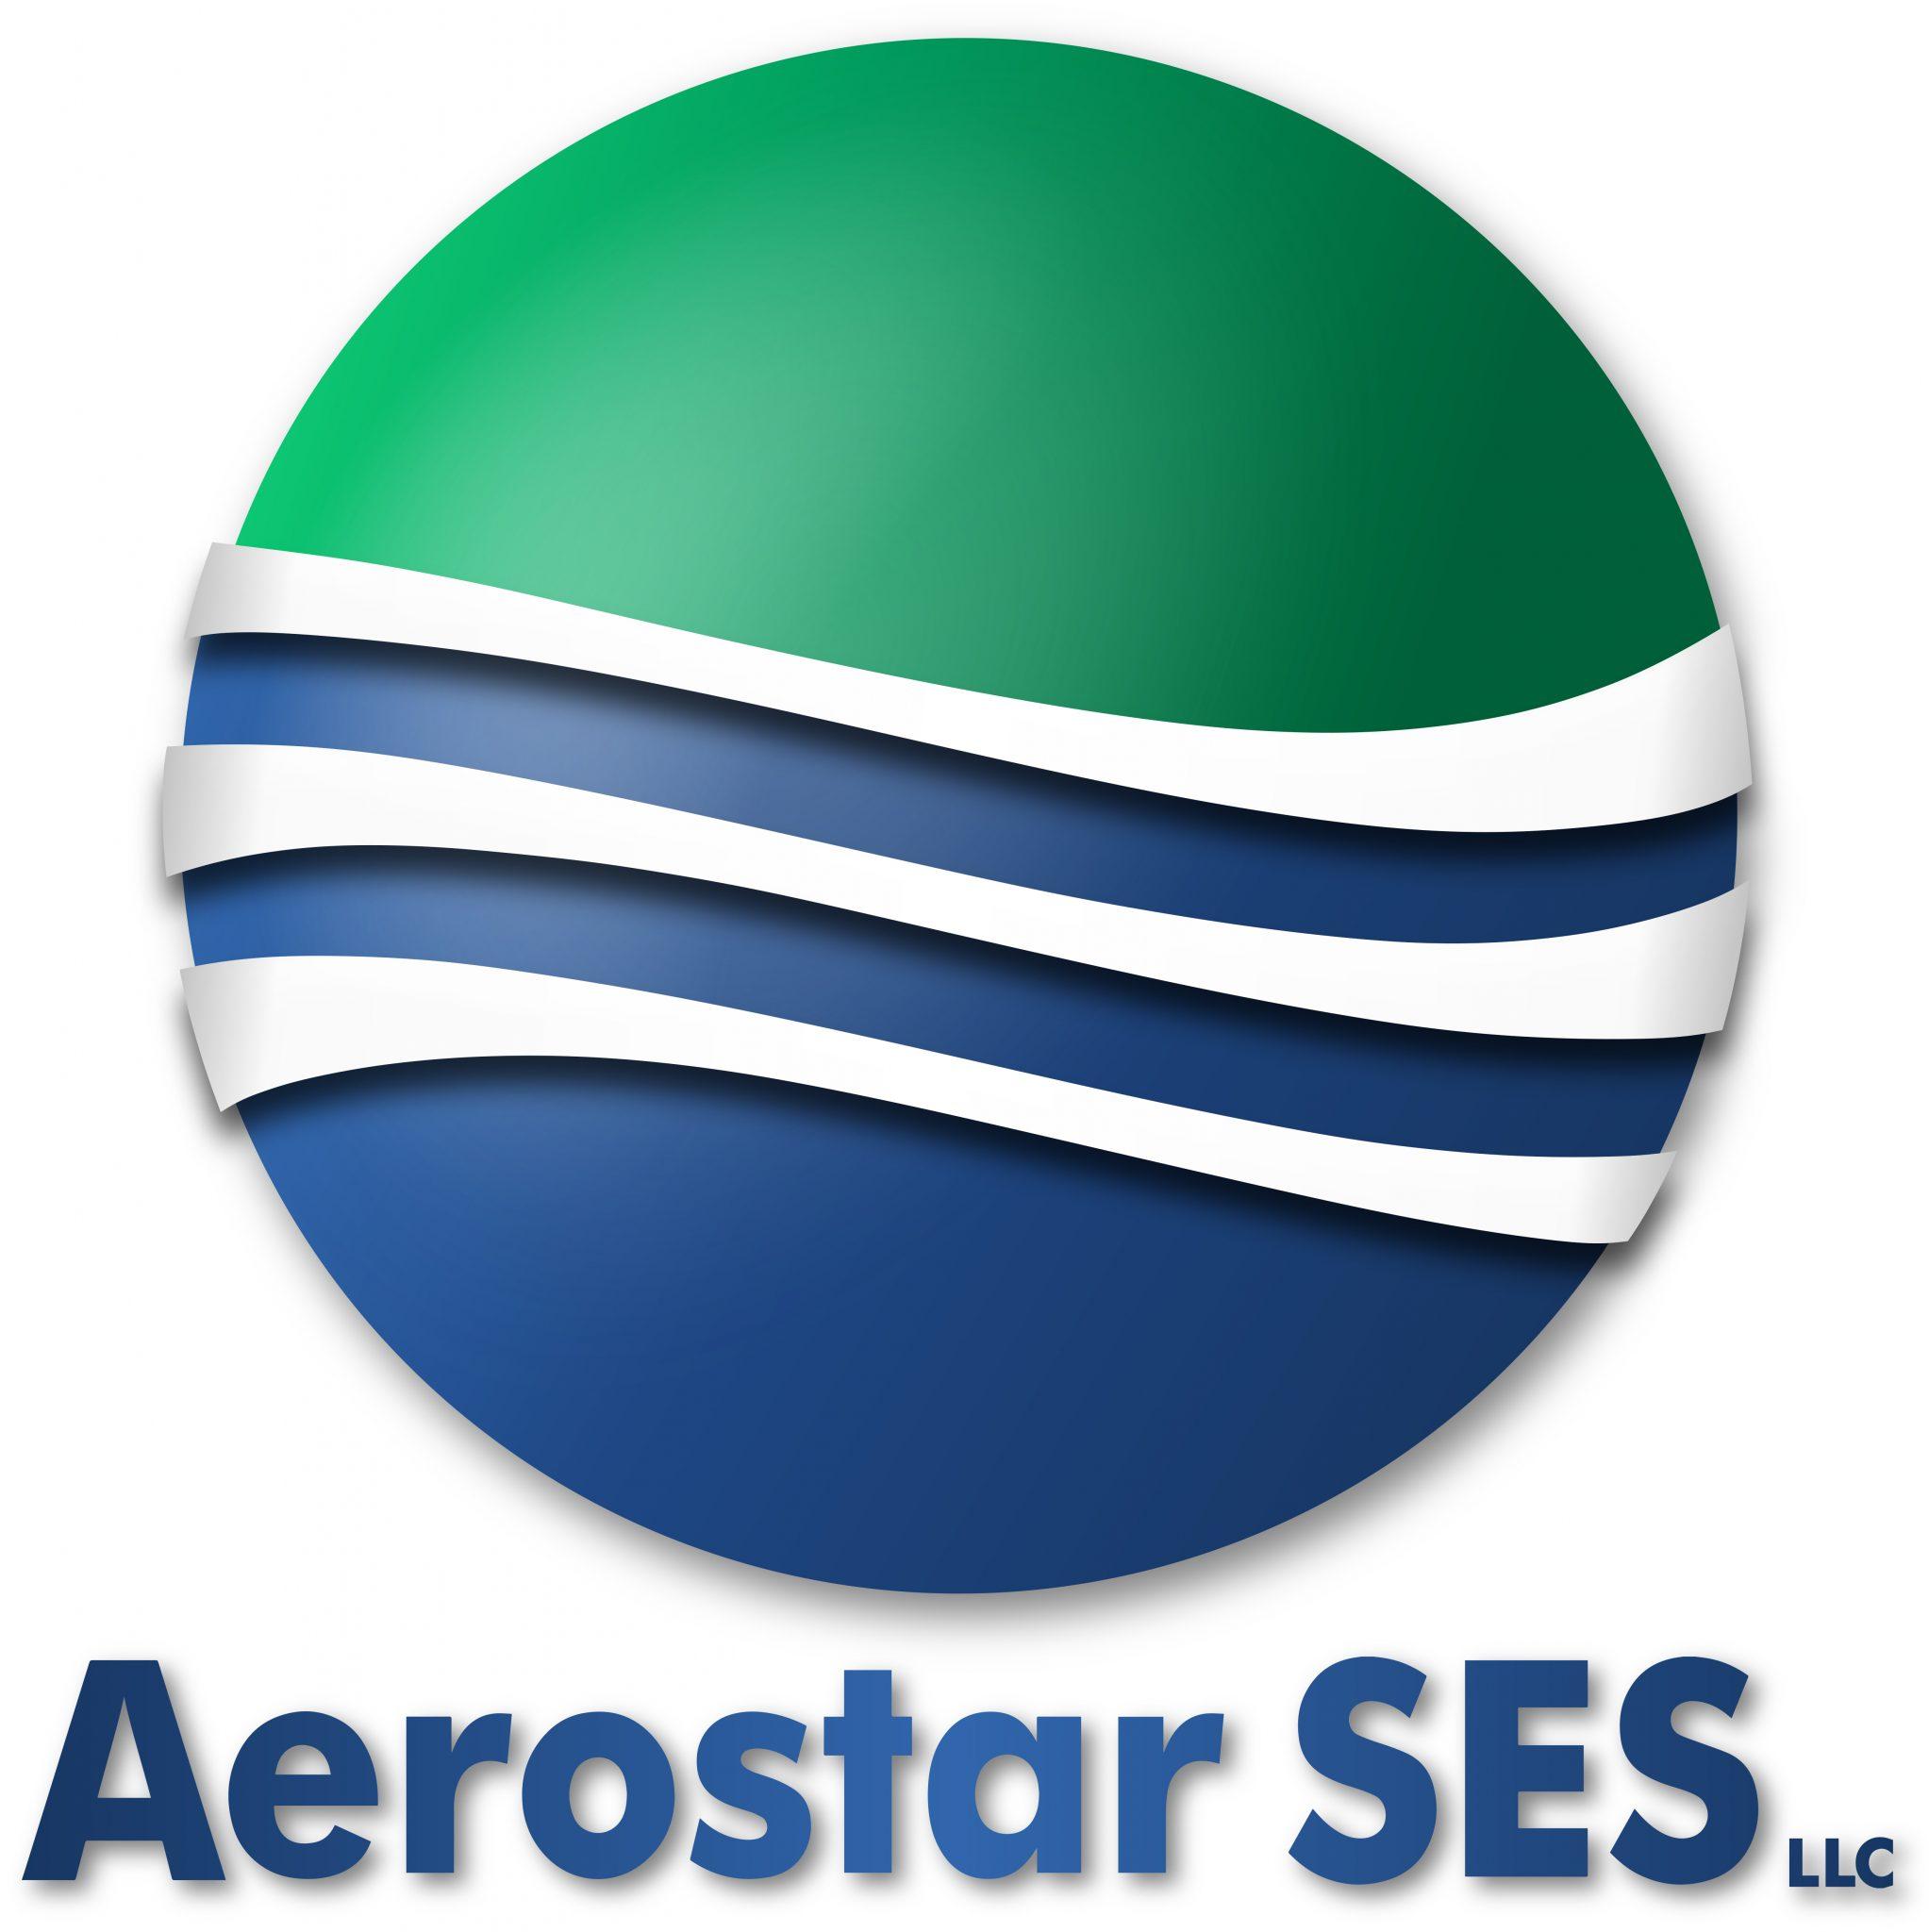 Aerostar SES